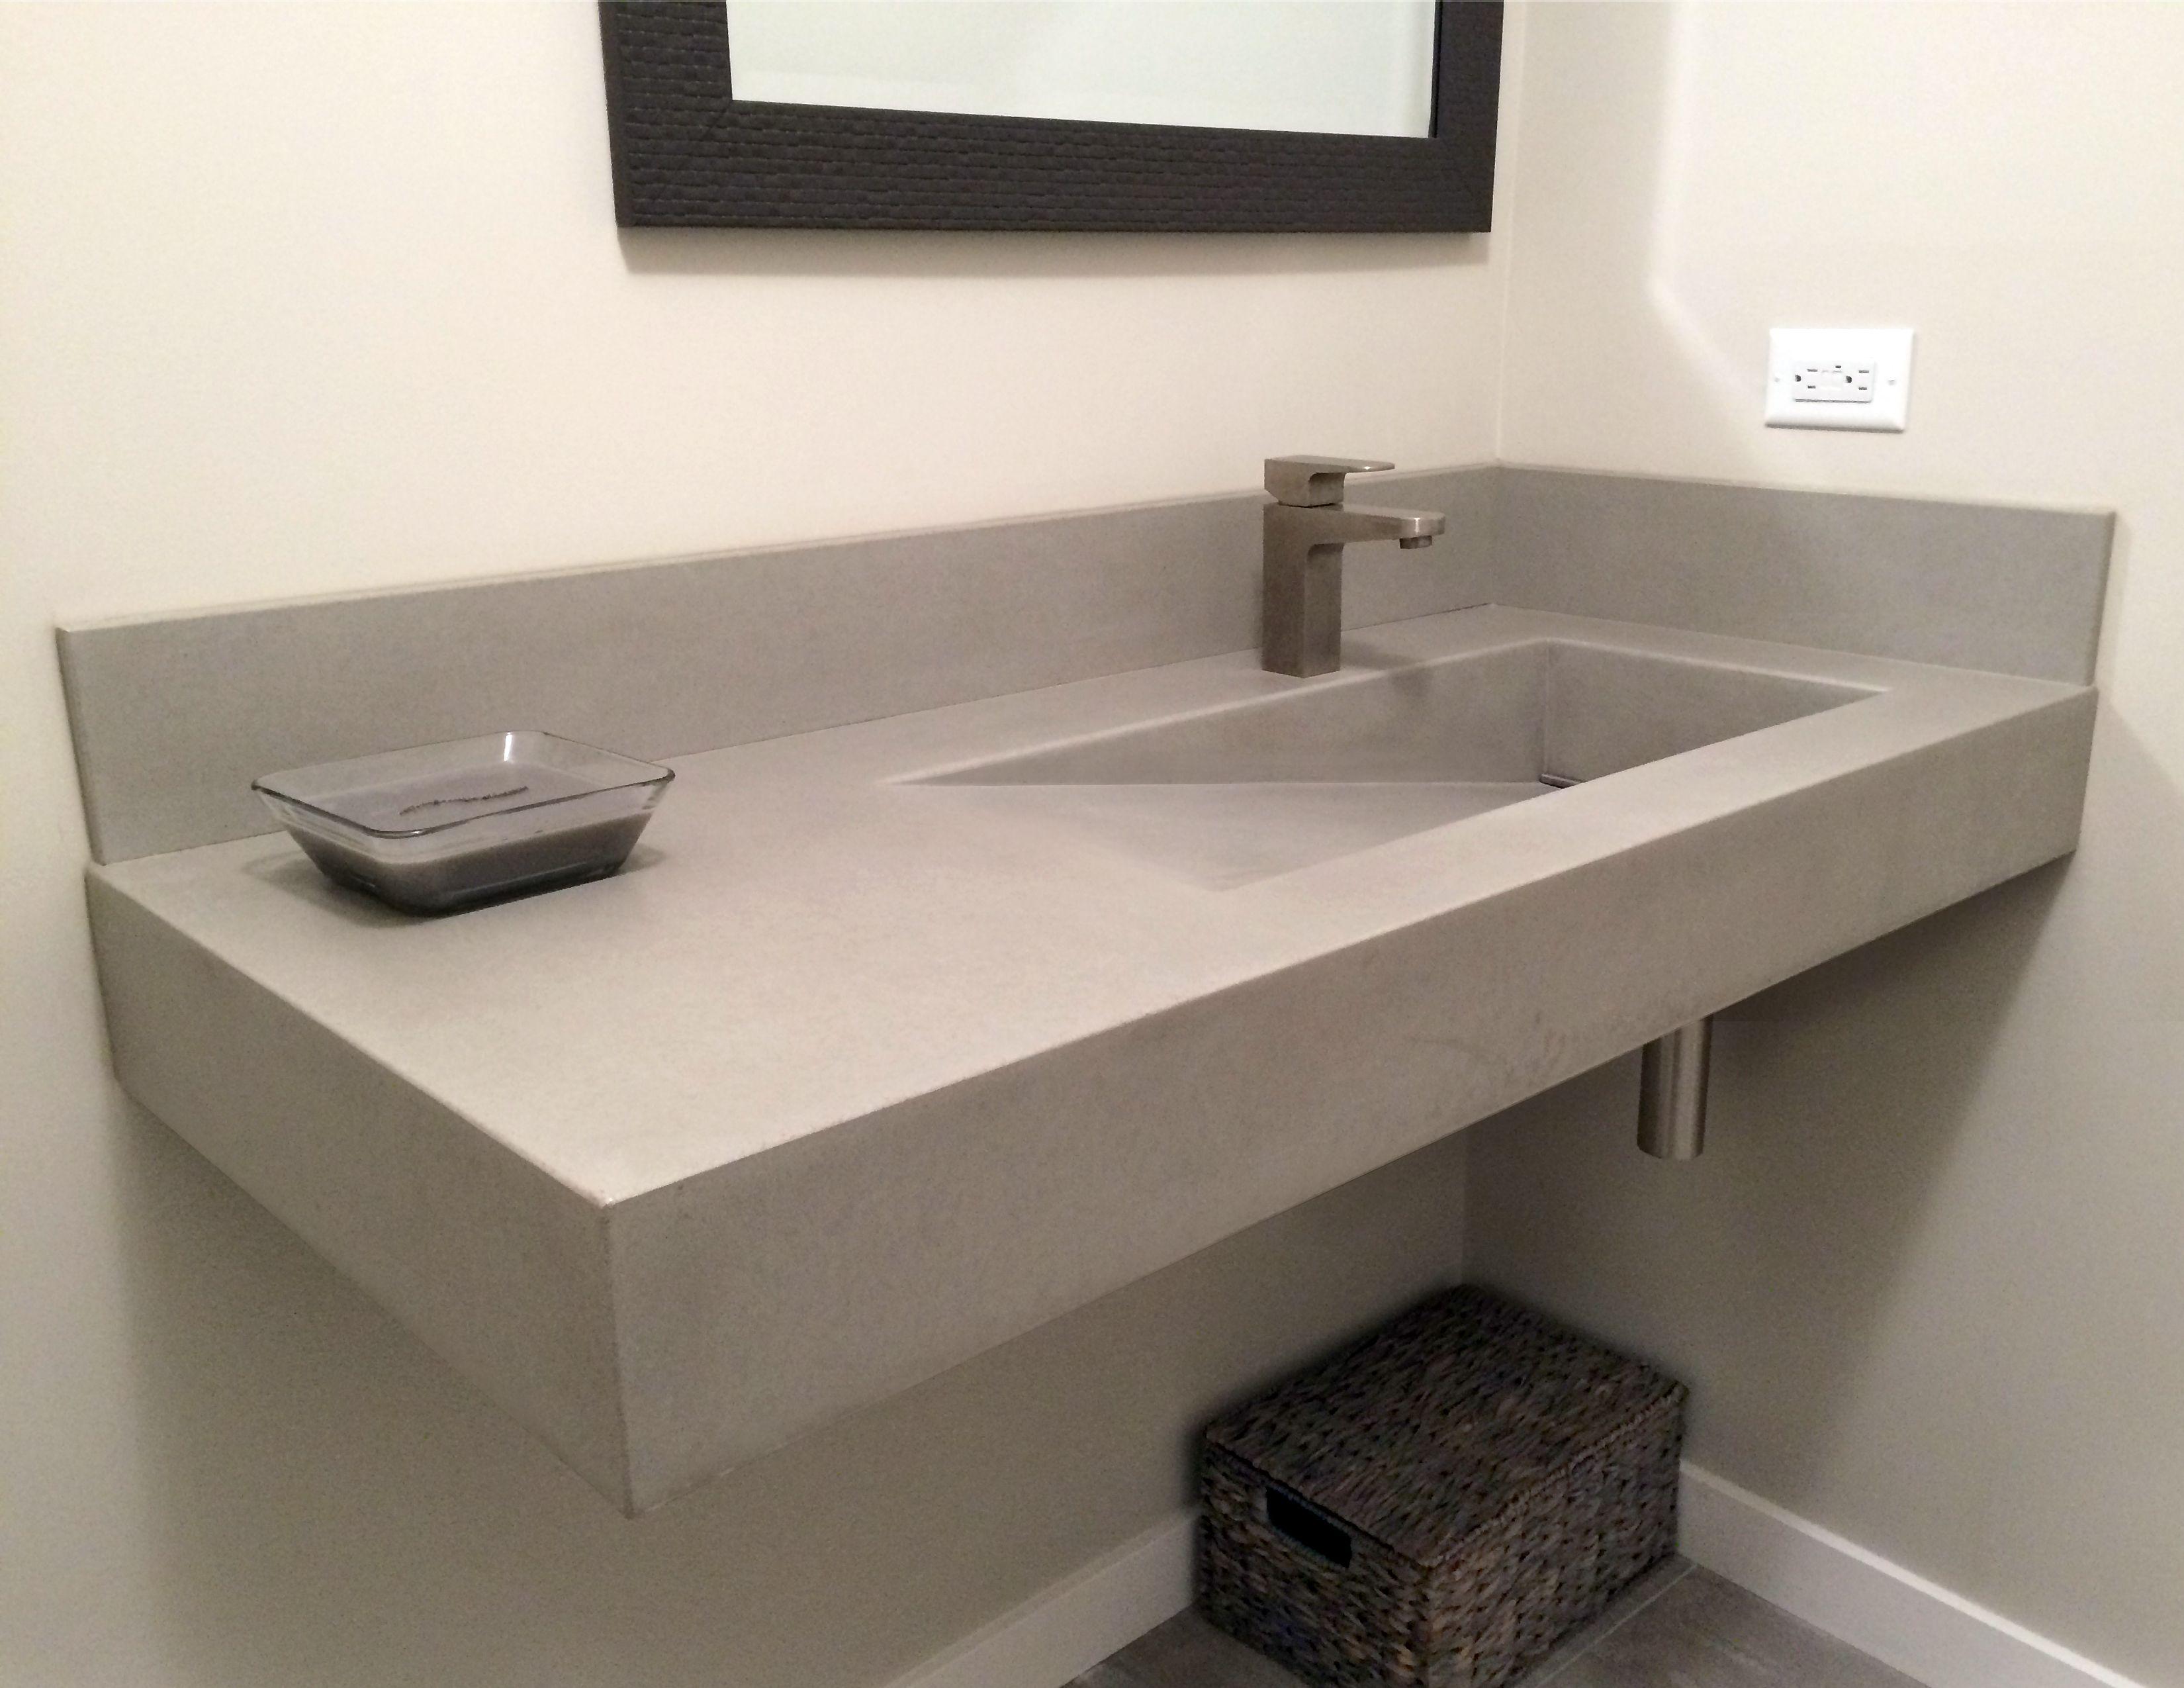 Accessible ADA Compliant Bathroom For All Stylish Trough